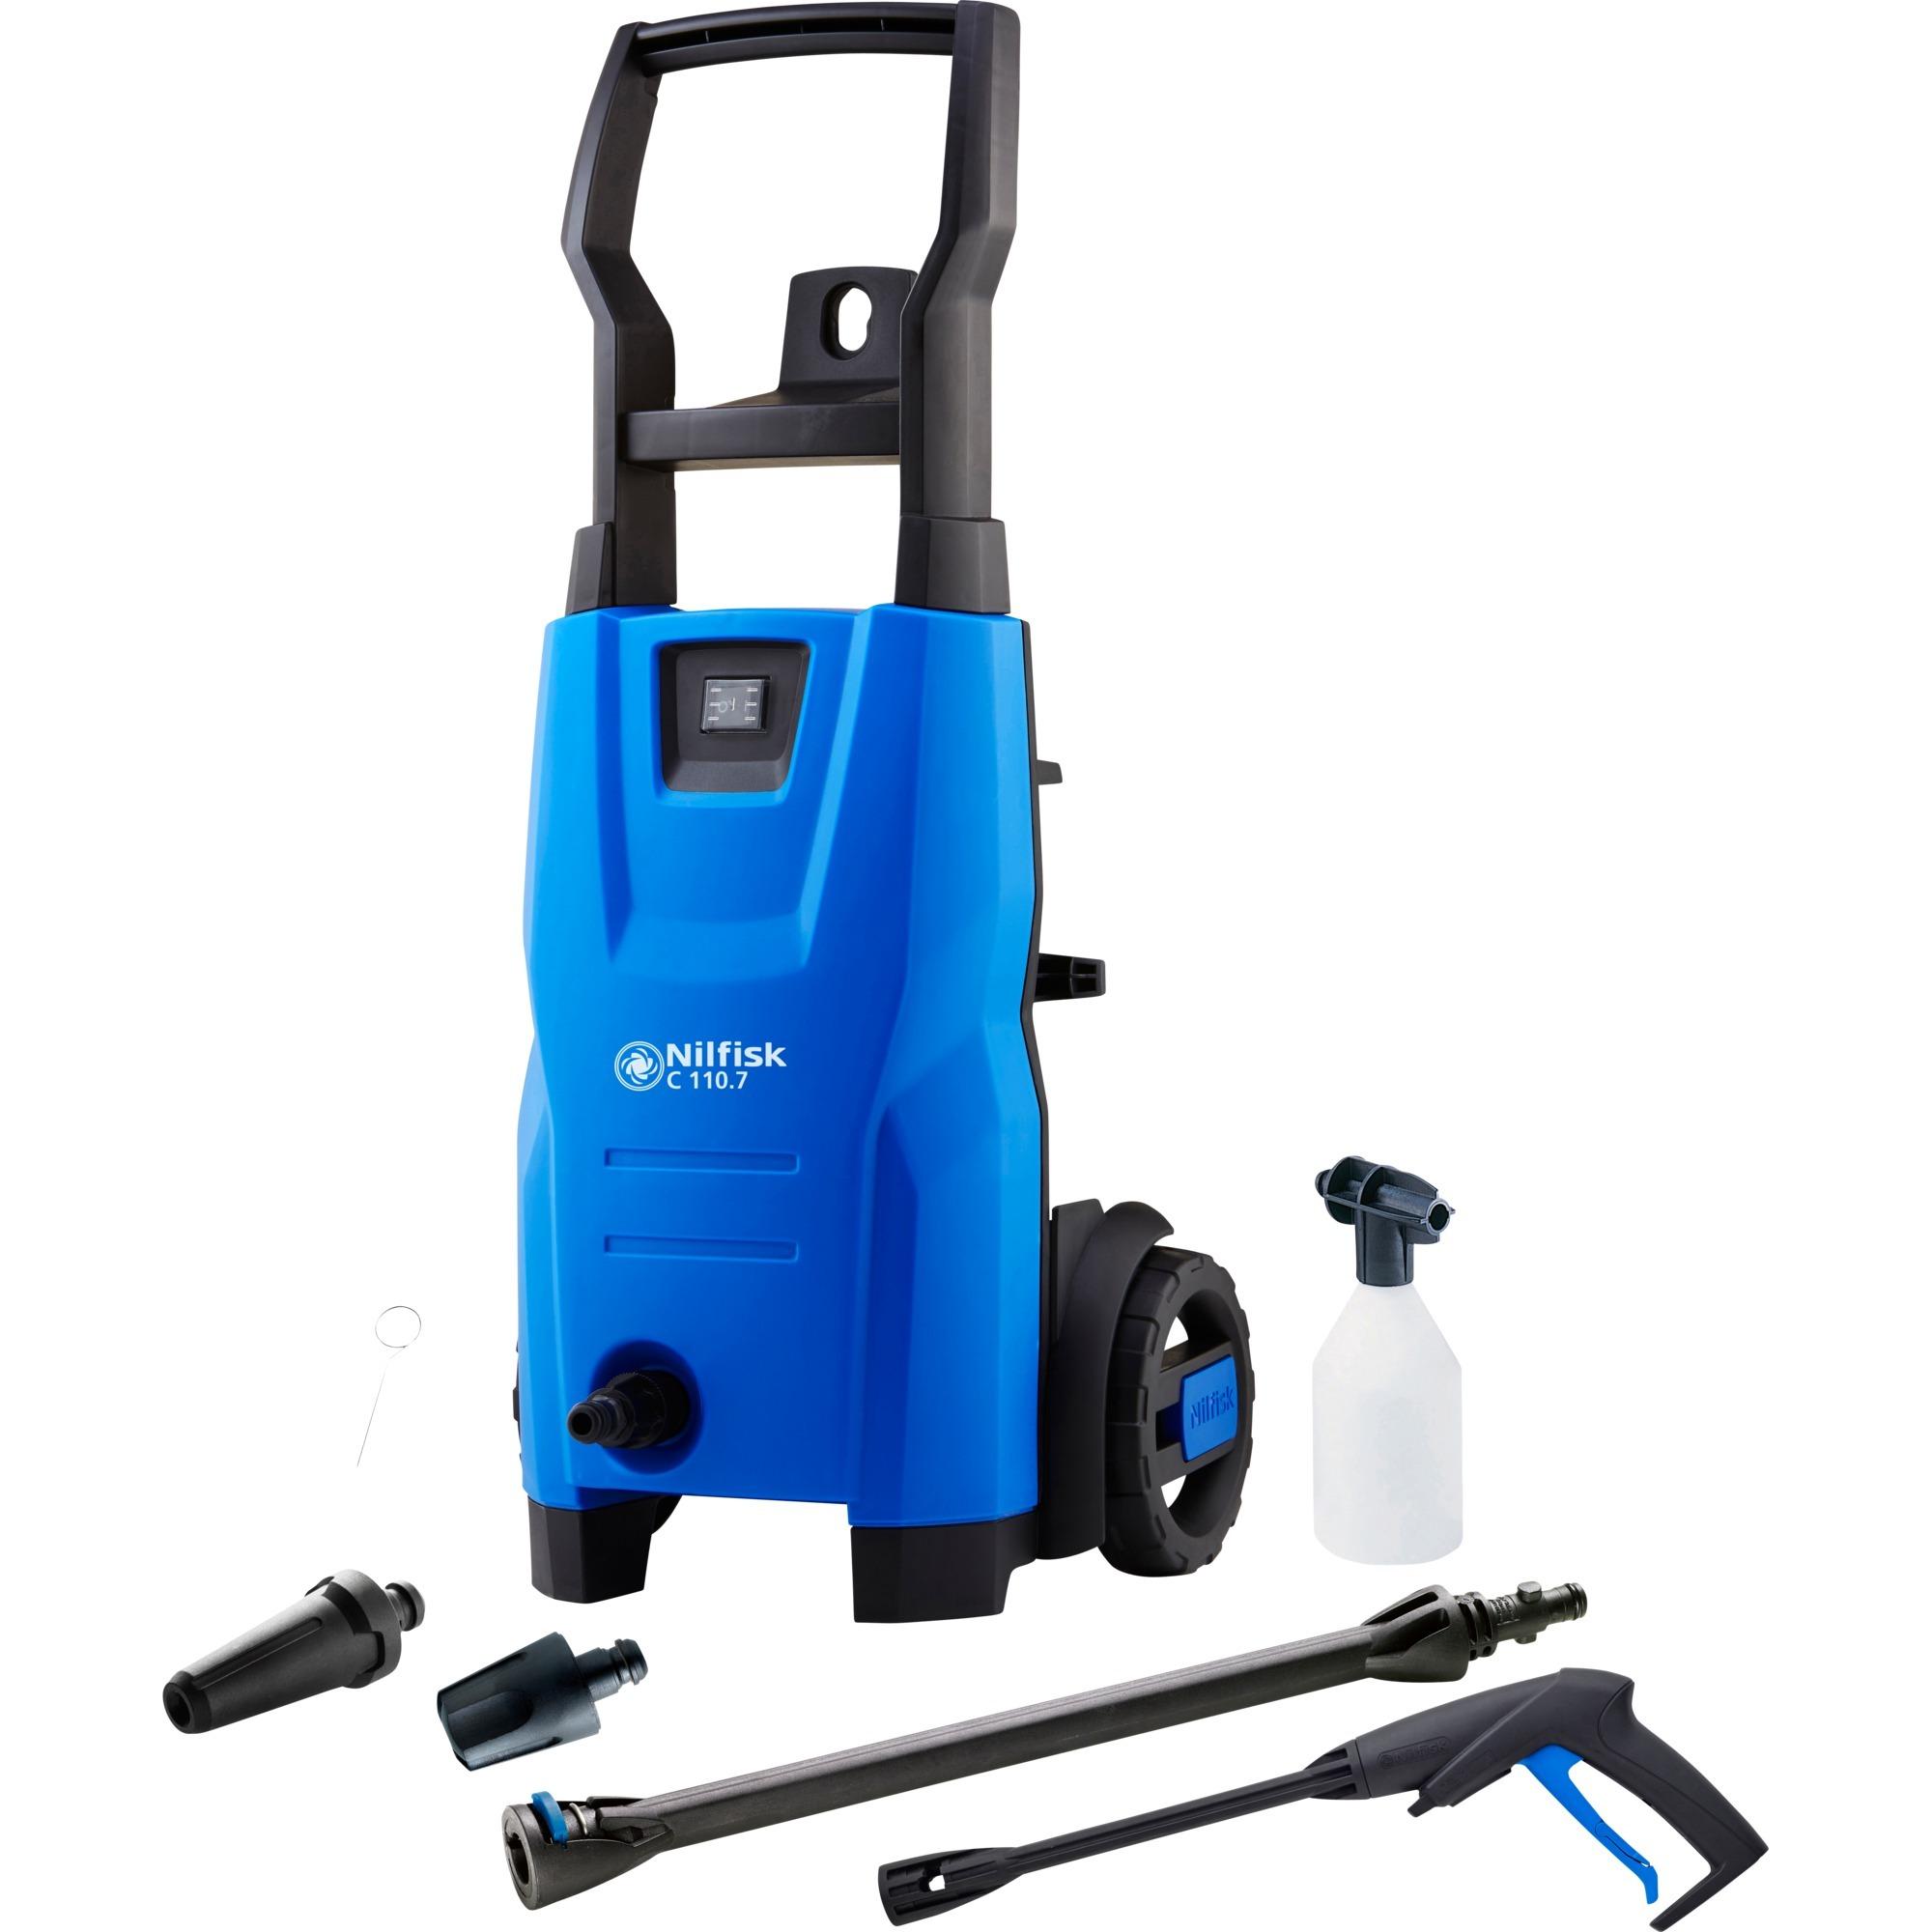 C 110.7-5 X-TRA EU Limpiadora de alta presión o Hidrolimpiadora Vertical Eléctrico Negro, Azul 440 l/h 1400 W, Hidrolimpiadora de alta presión